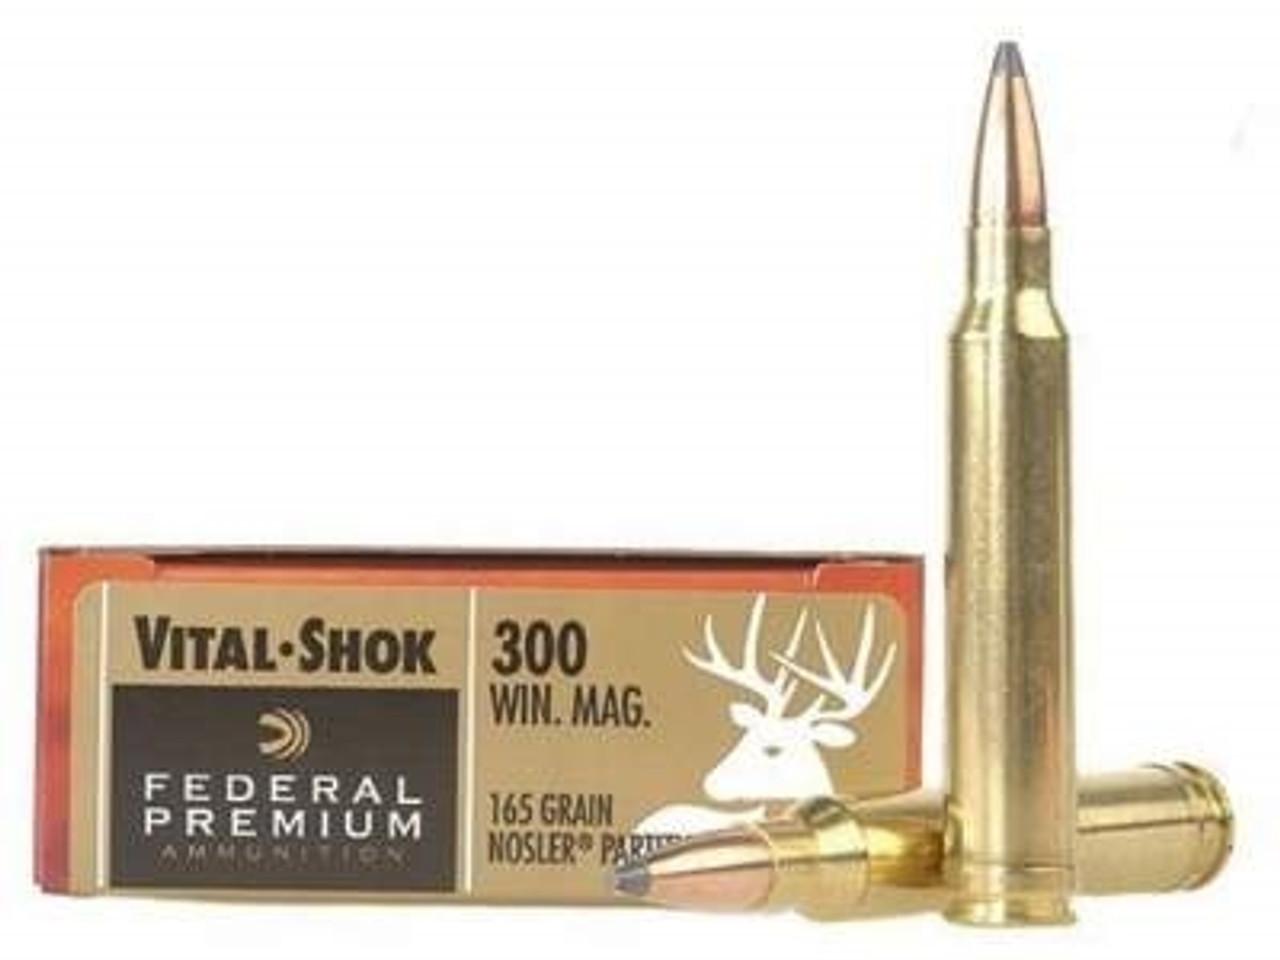 Federal 300 Win Mag Ammunition Vital-Shok P300WK 165 Grain Nosler Partition  20 rounds